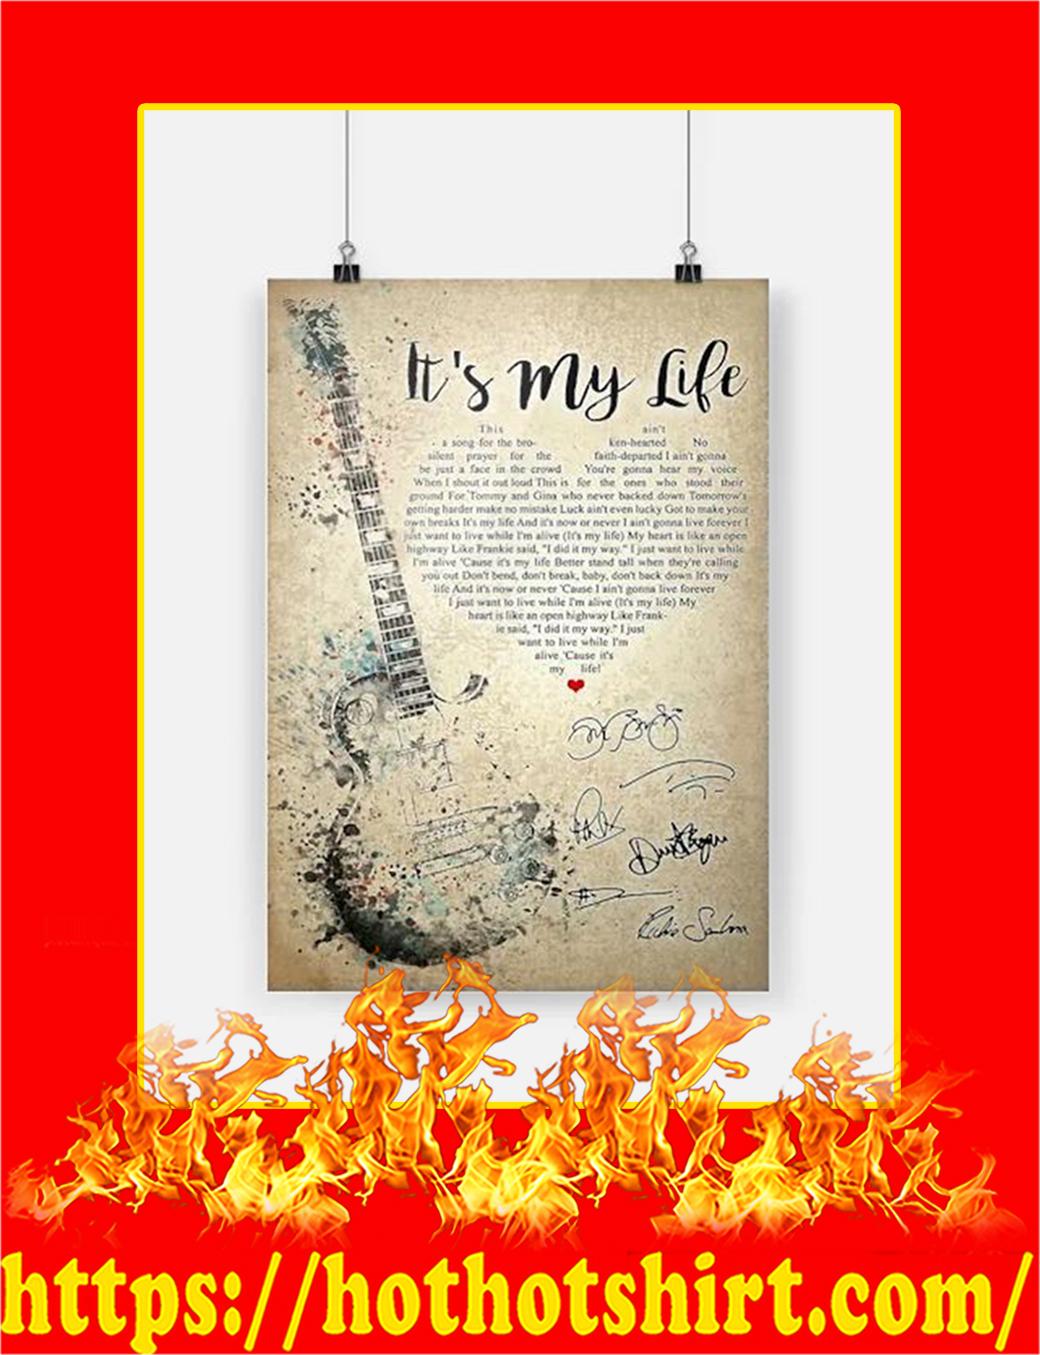 It's My Life Bon Jovi Poster - A2